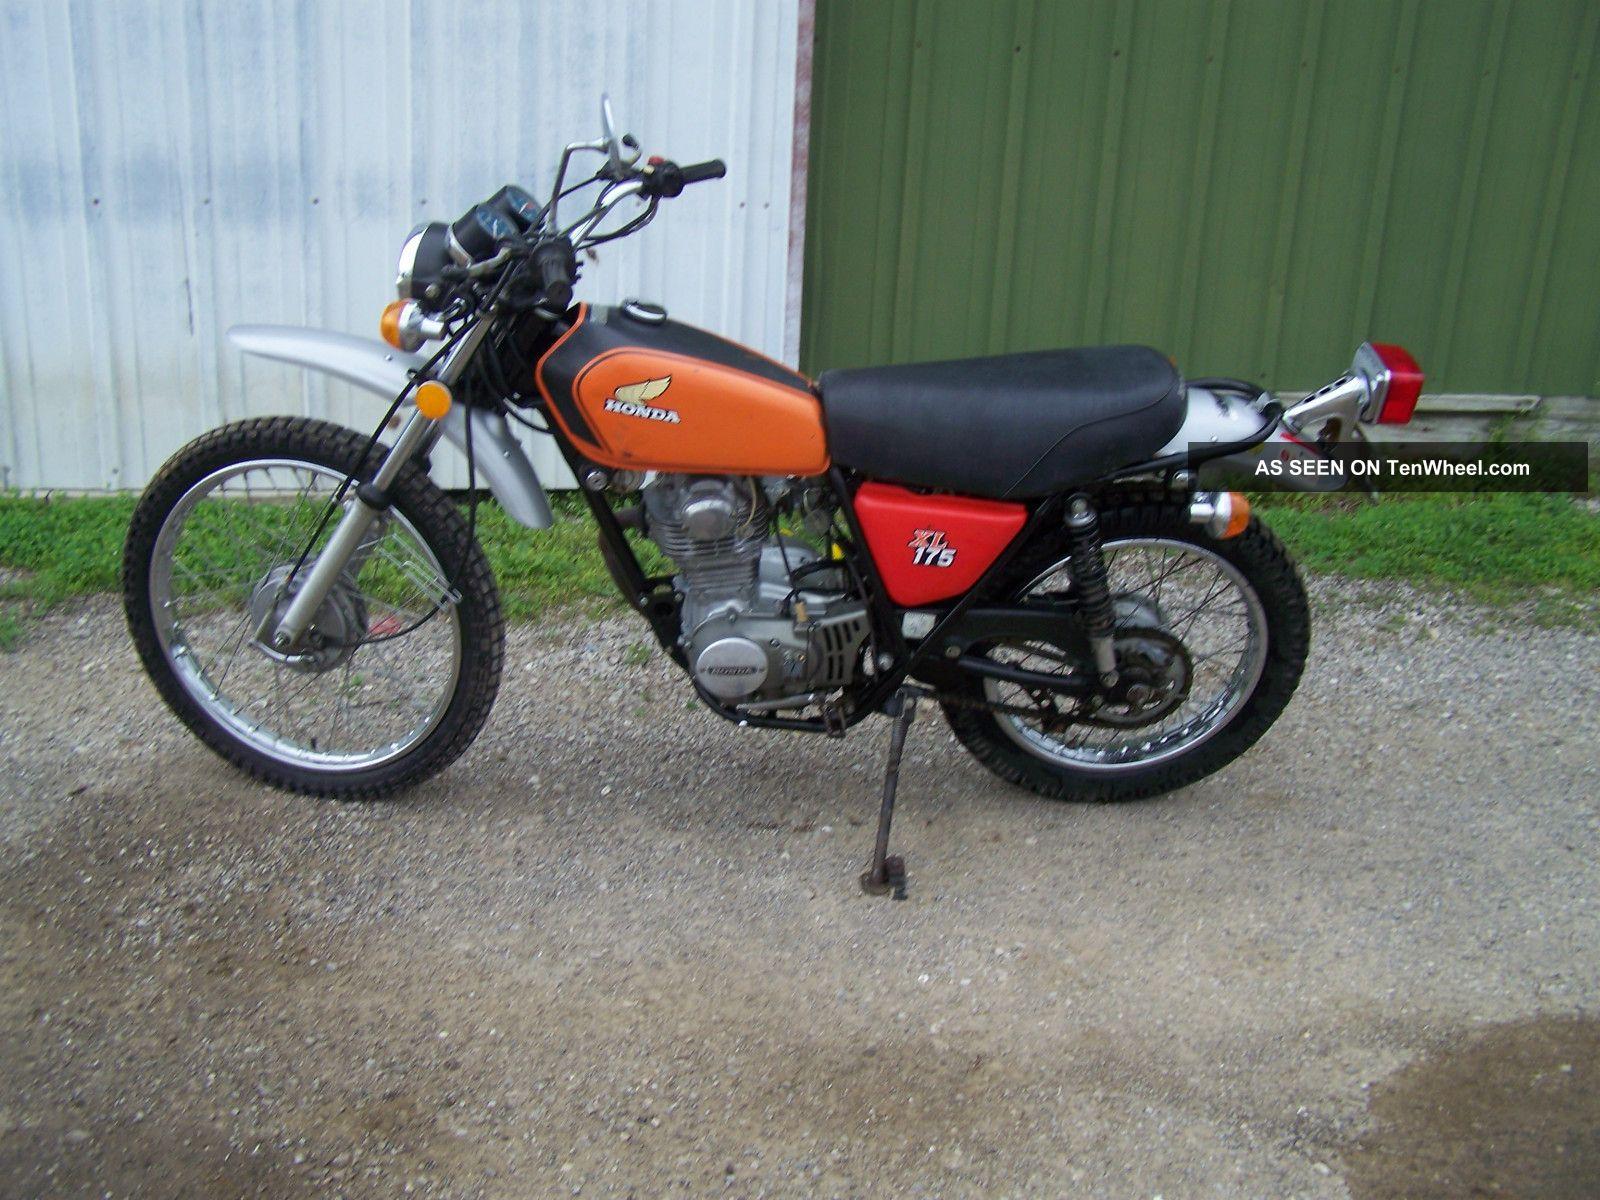 1975 honda ct90 wiring diagram wye delta cl70 ct110 trail bike ~ elsalvadorla